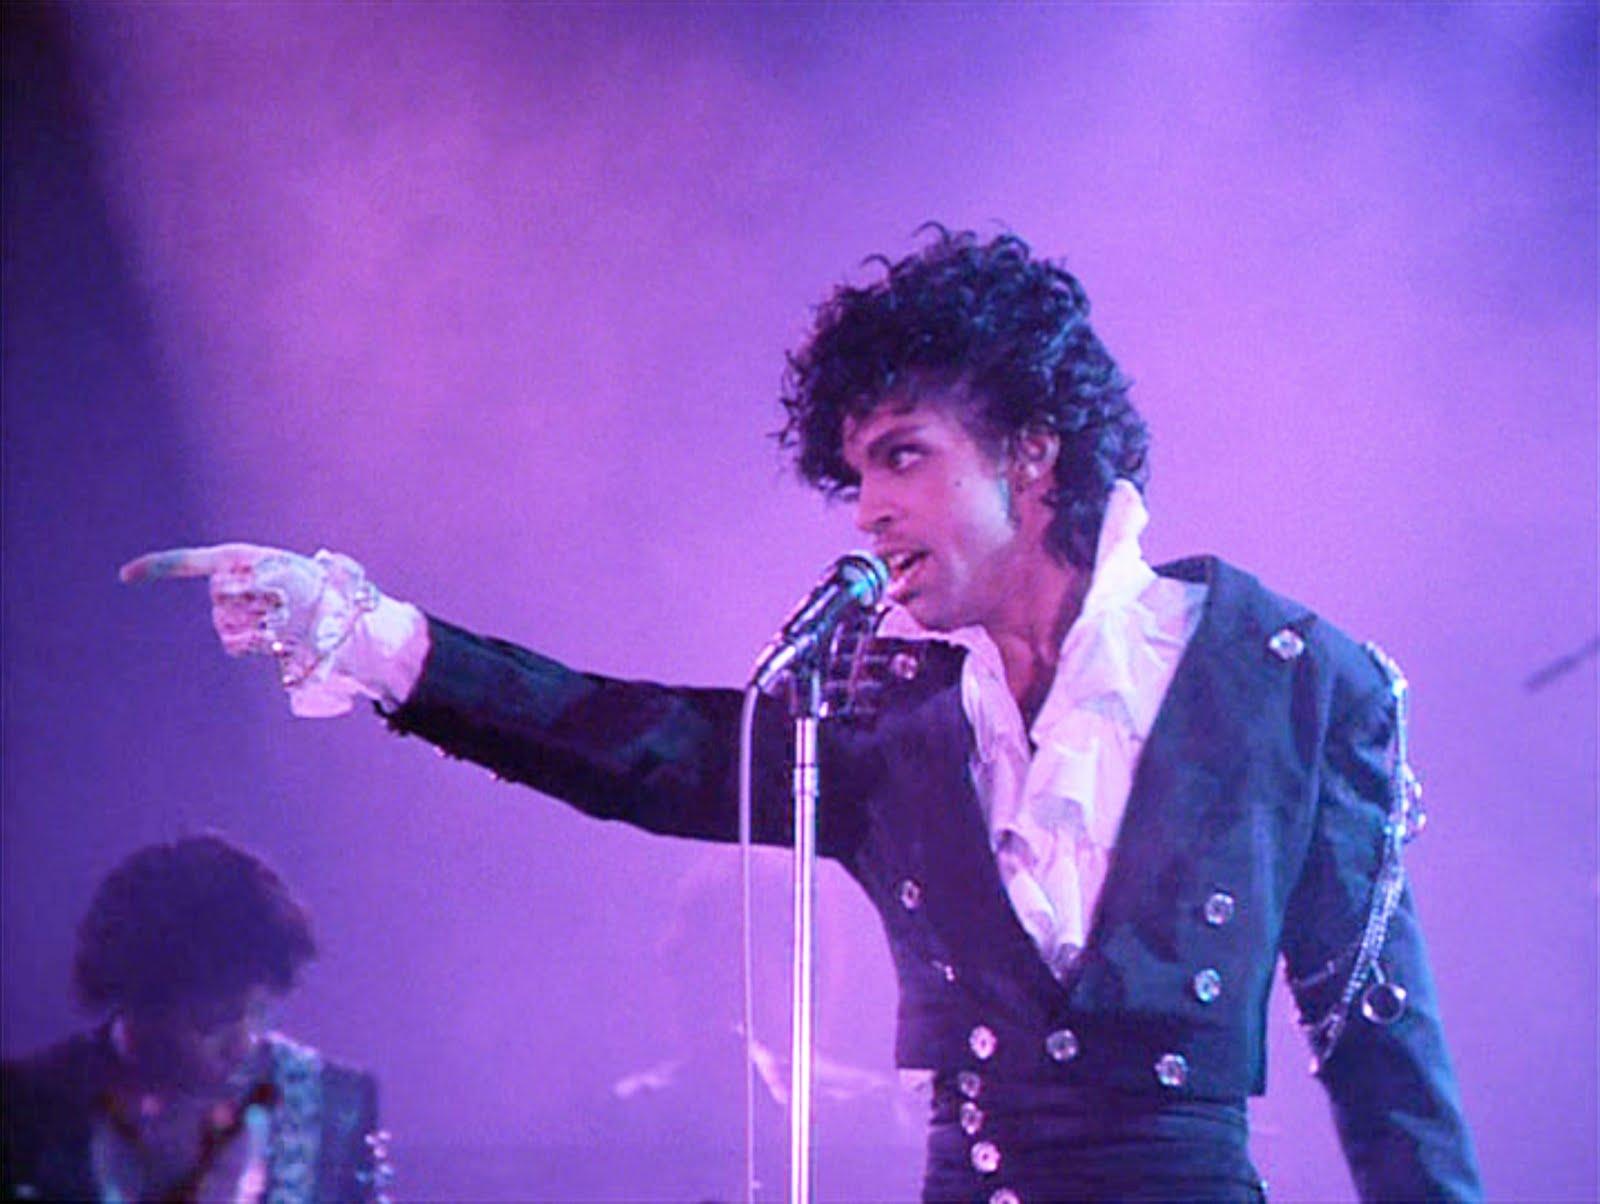 Hommage à Jamie Starr, alias Alexander Nevermind, alias Joey Coco, The Artist Formerly Known as Prince